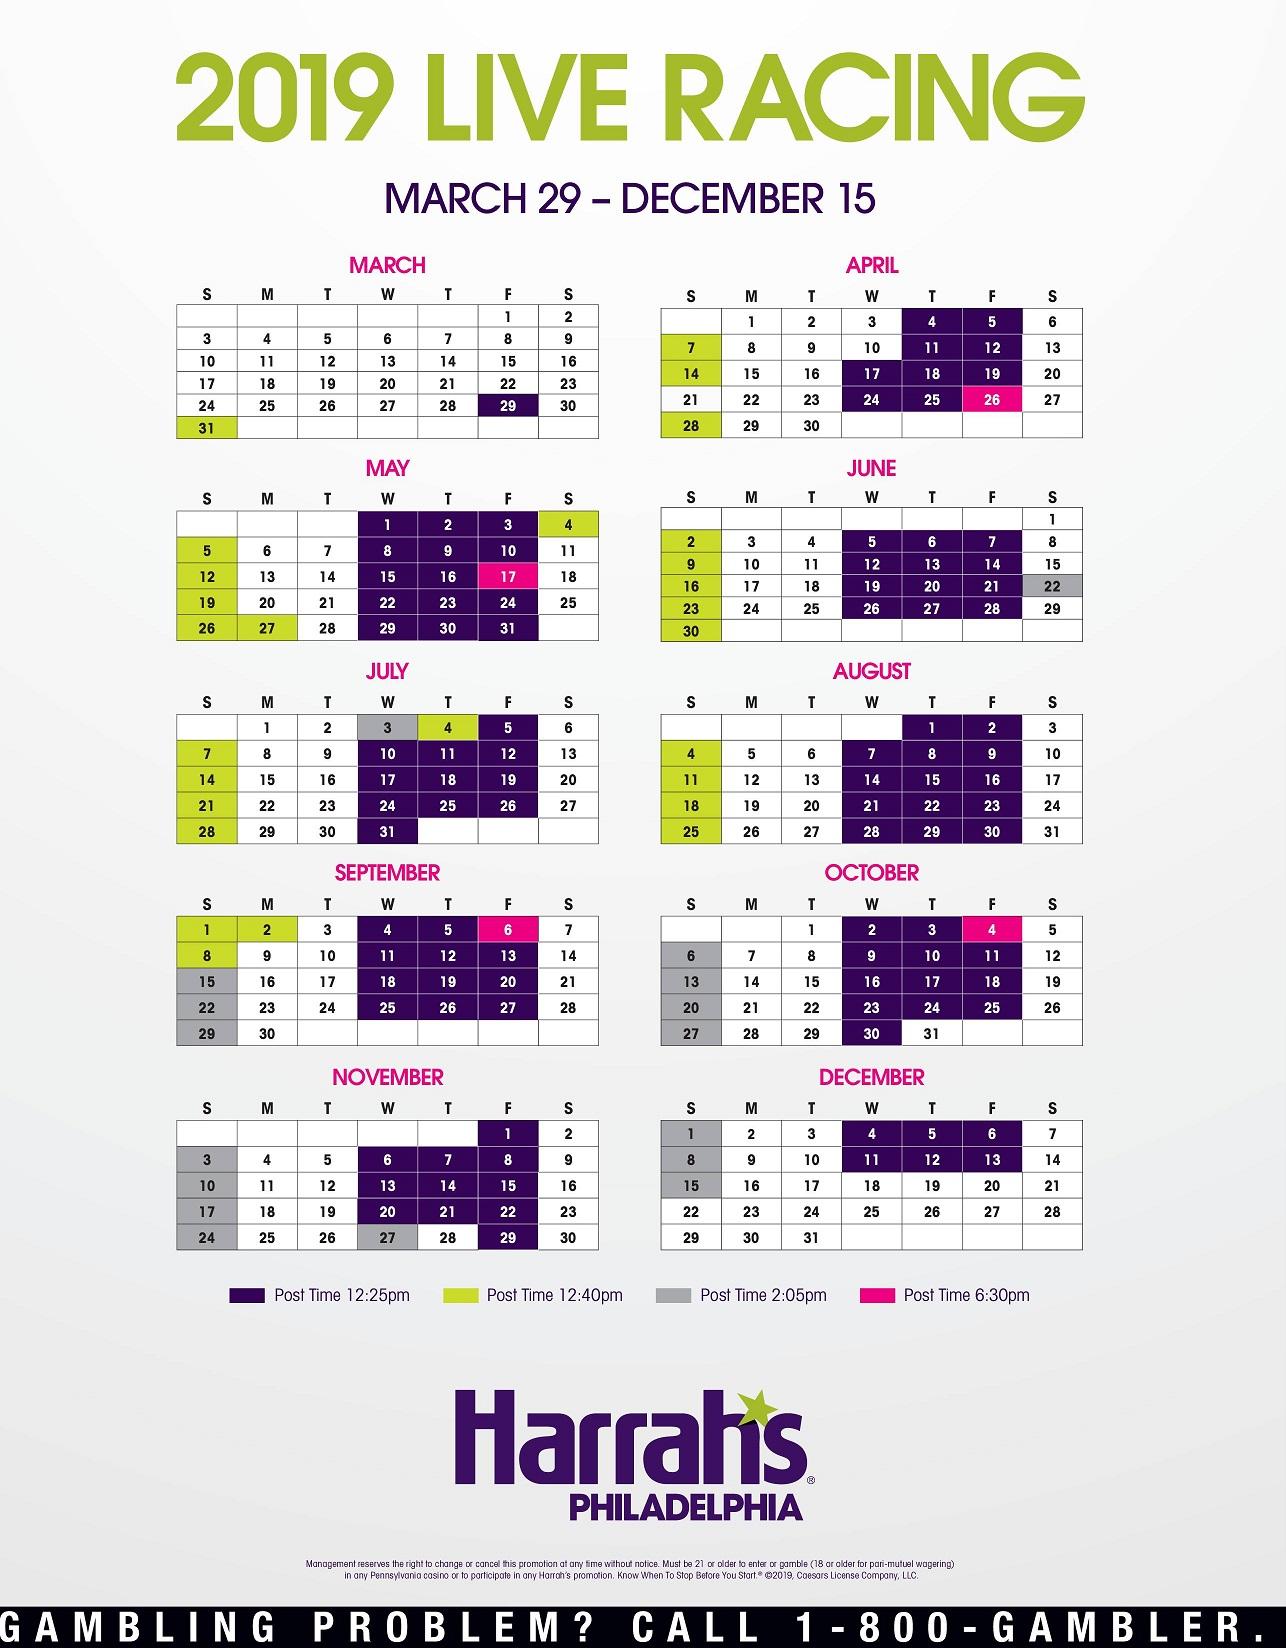 HarrahS Racetrack